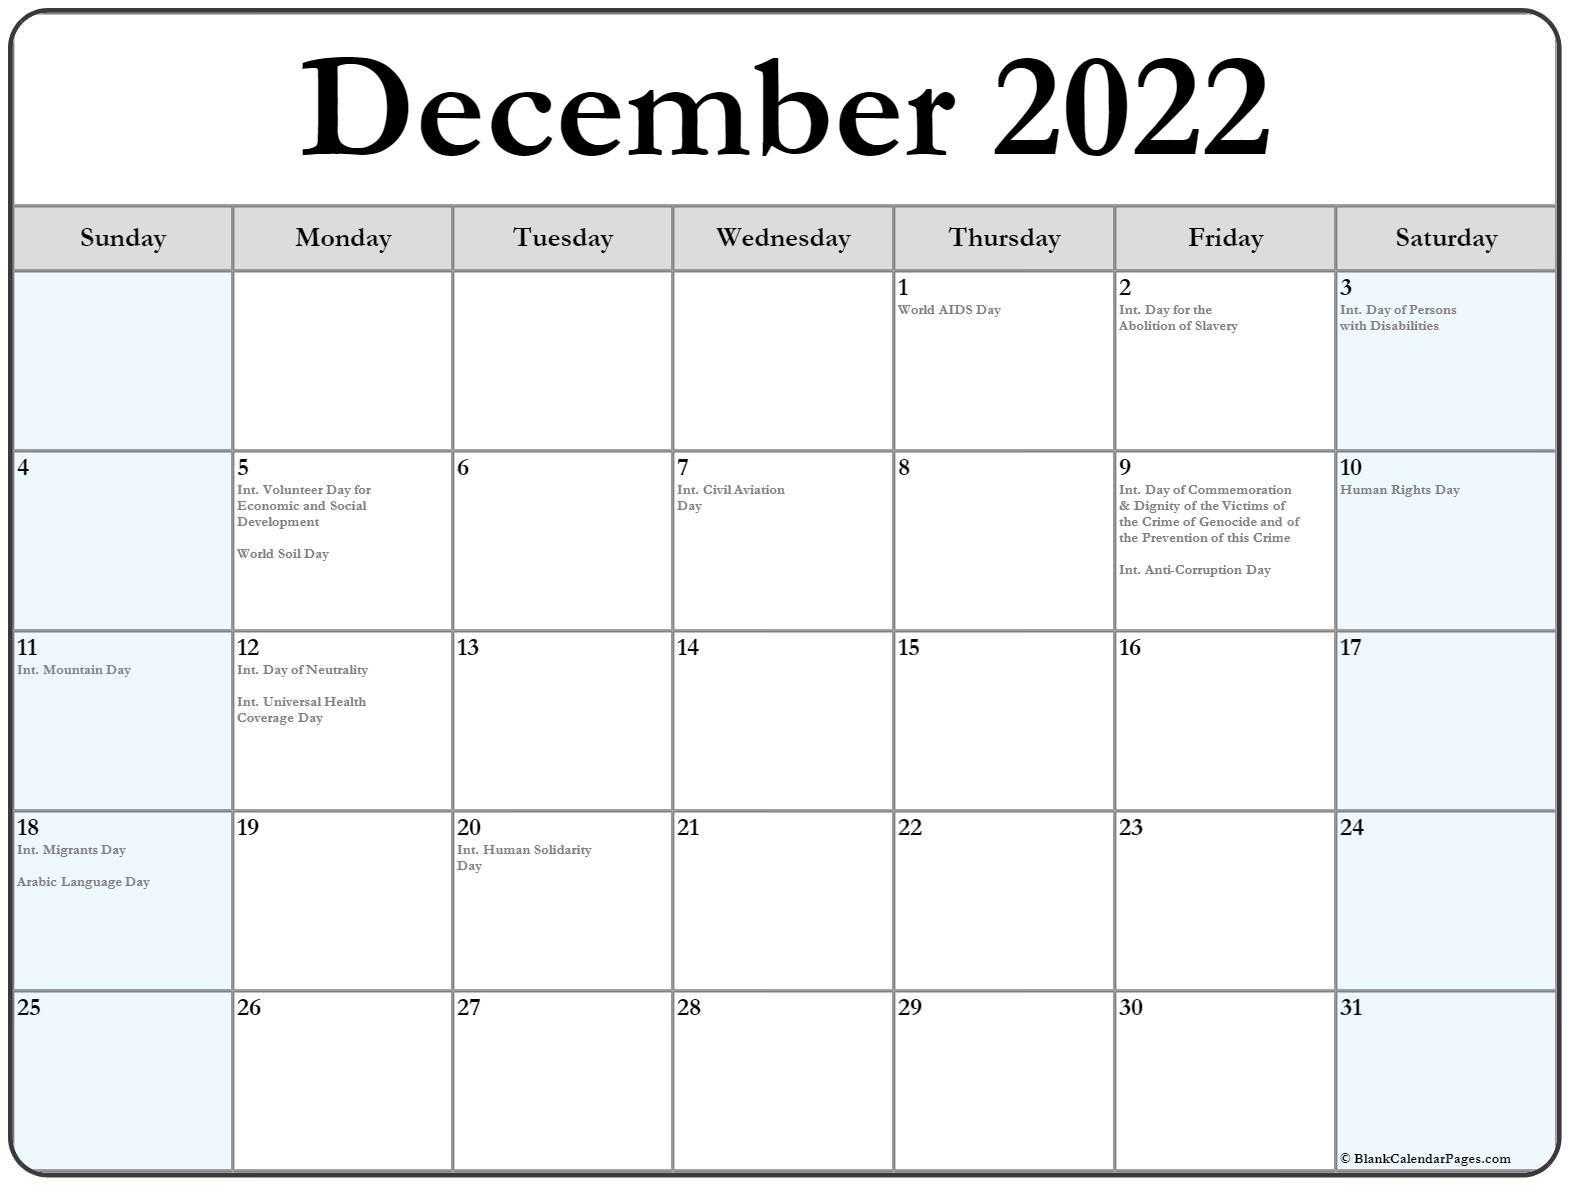 December 2020 calendar with holidays